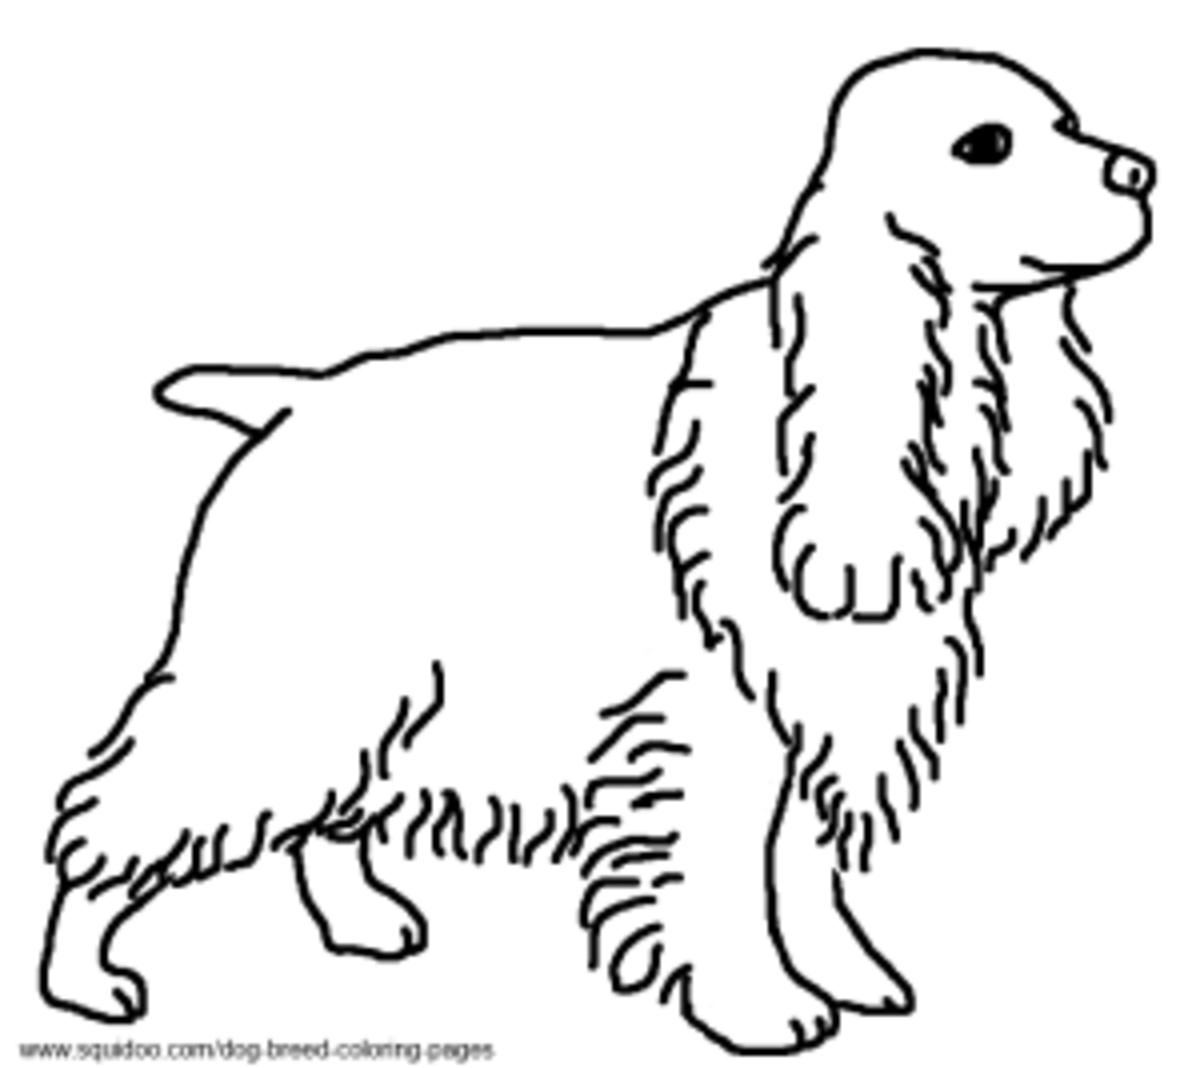 Cocker Spaniel coloring page